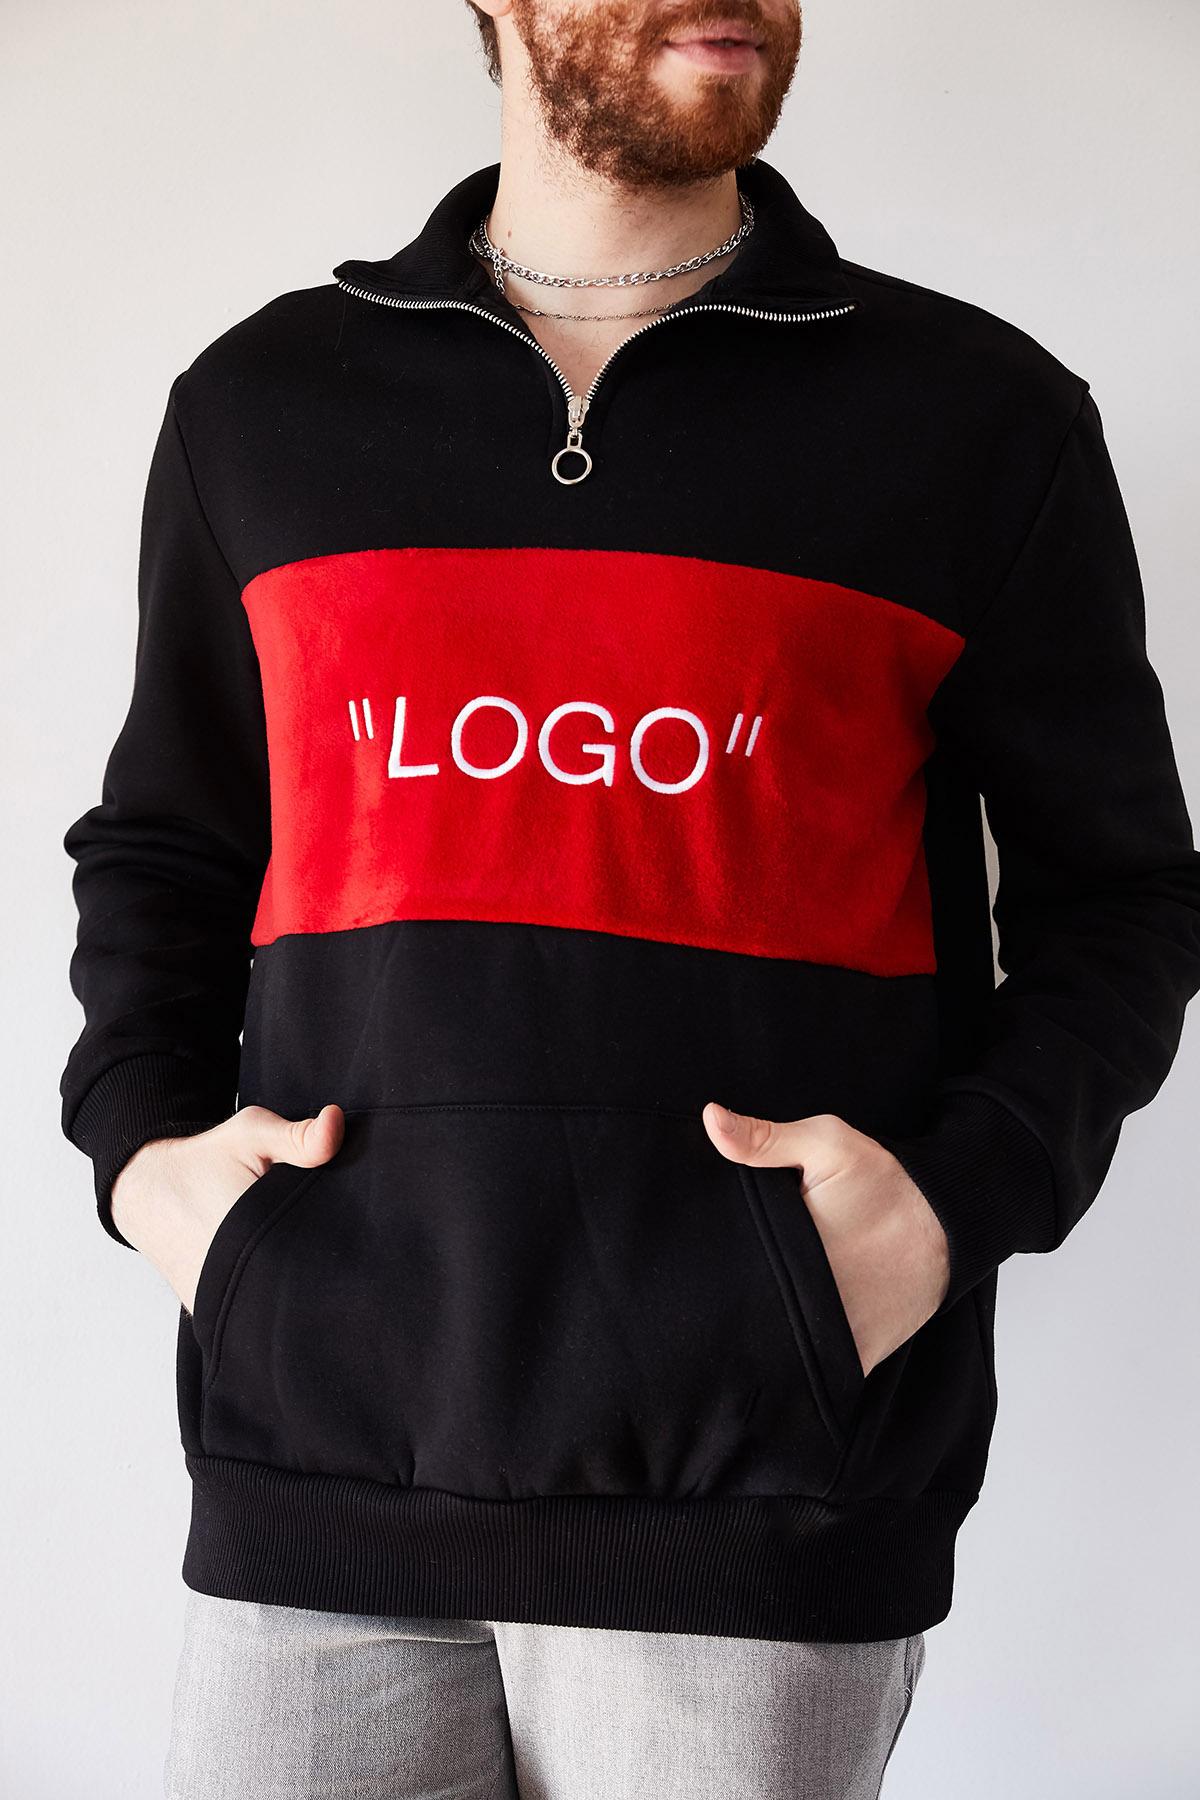 XHAN - Siyah Nakışlı Üç İplik Sweatshirt 1KXE8-44231-02